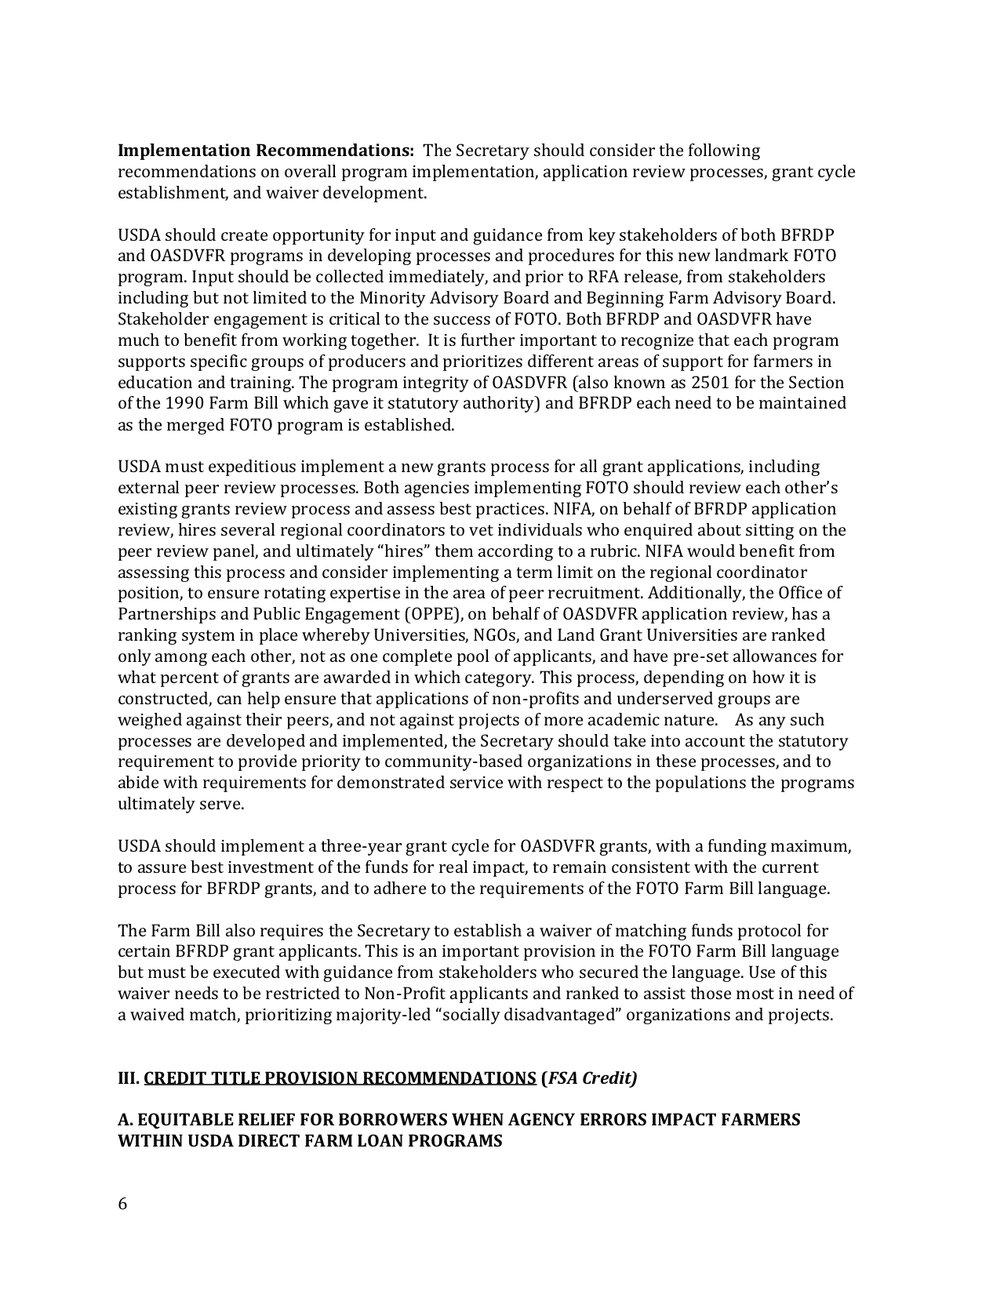 2018 Farm Bill Implementation Recommendations - Rural Co etal final March 1 page 7.jpg